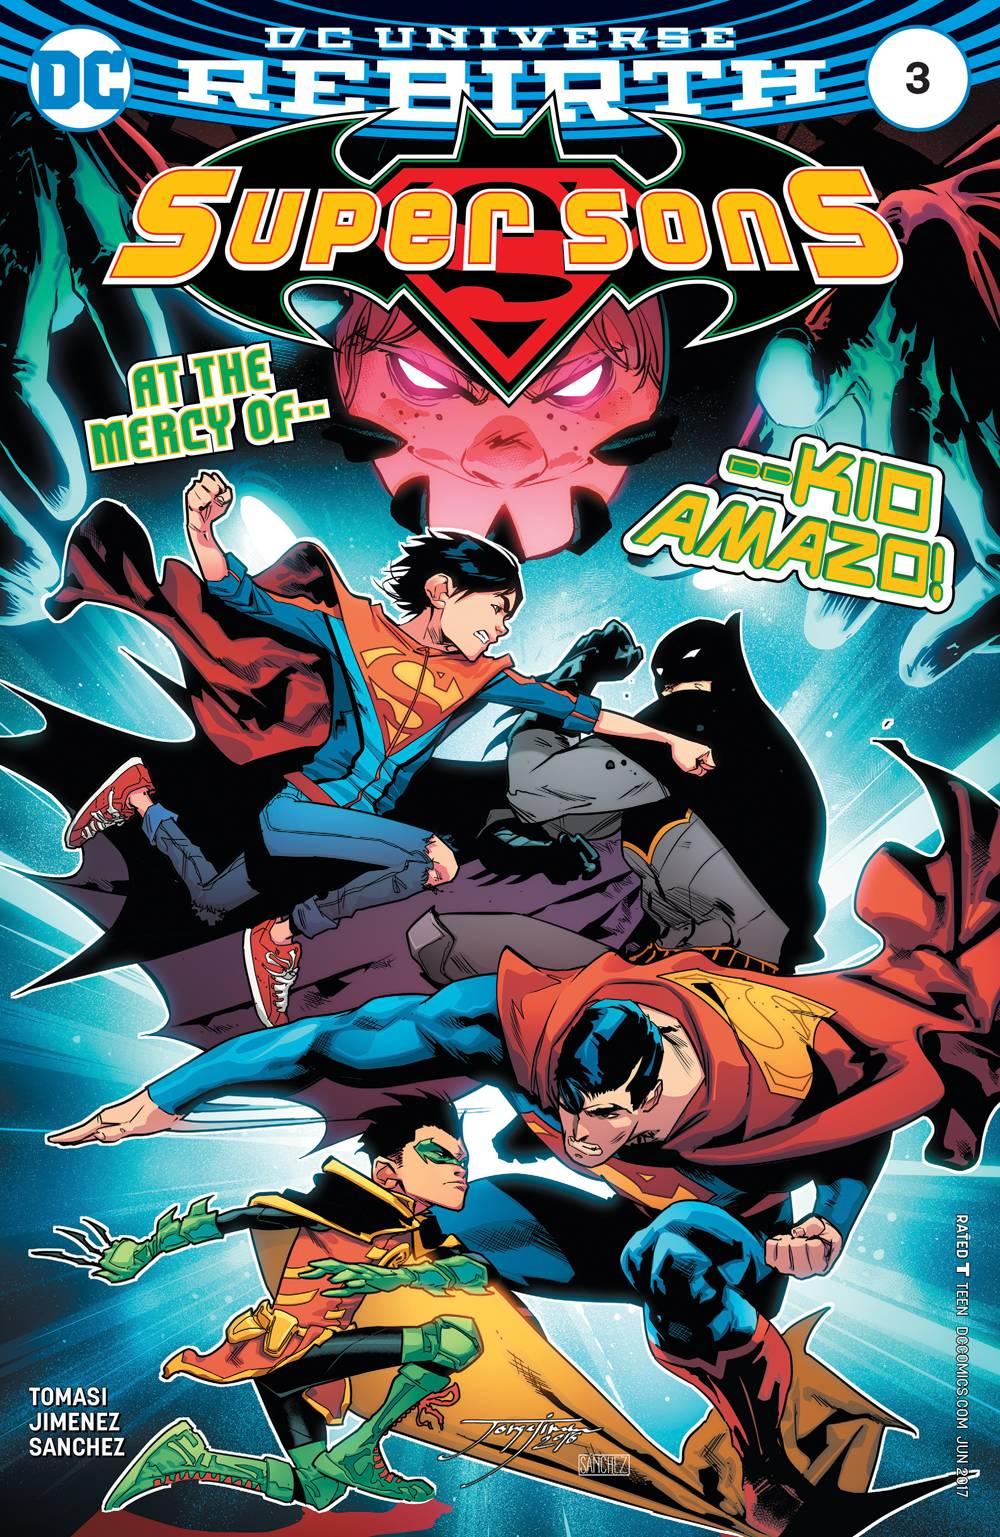 Super Sons #3.jpg